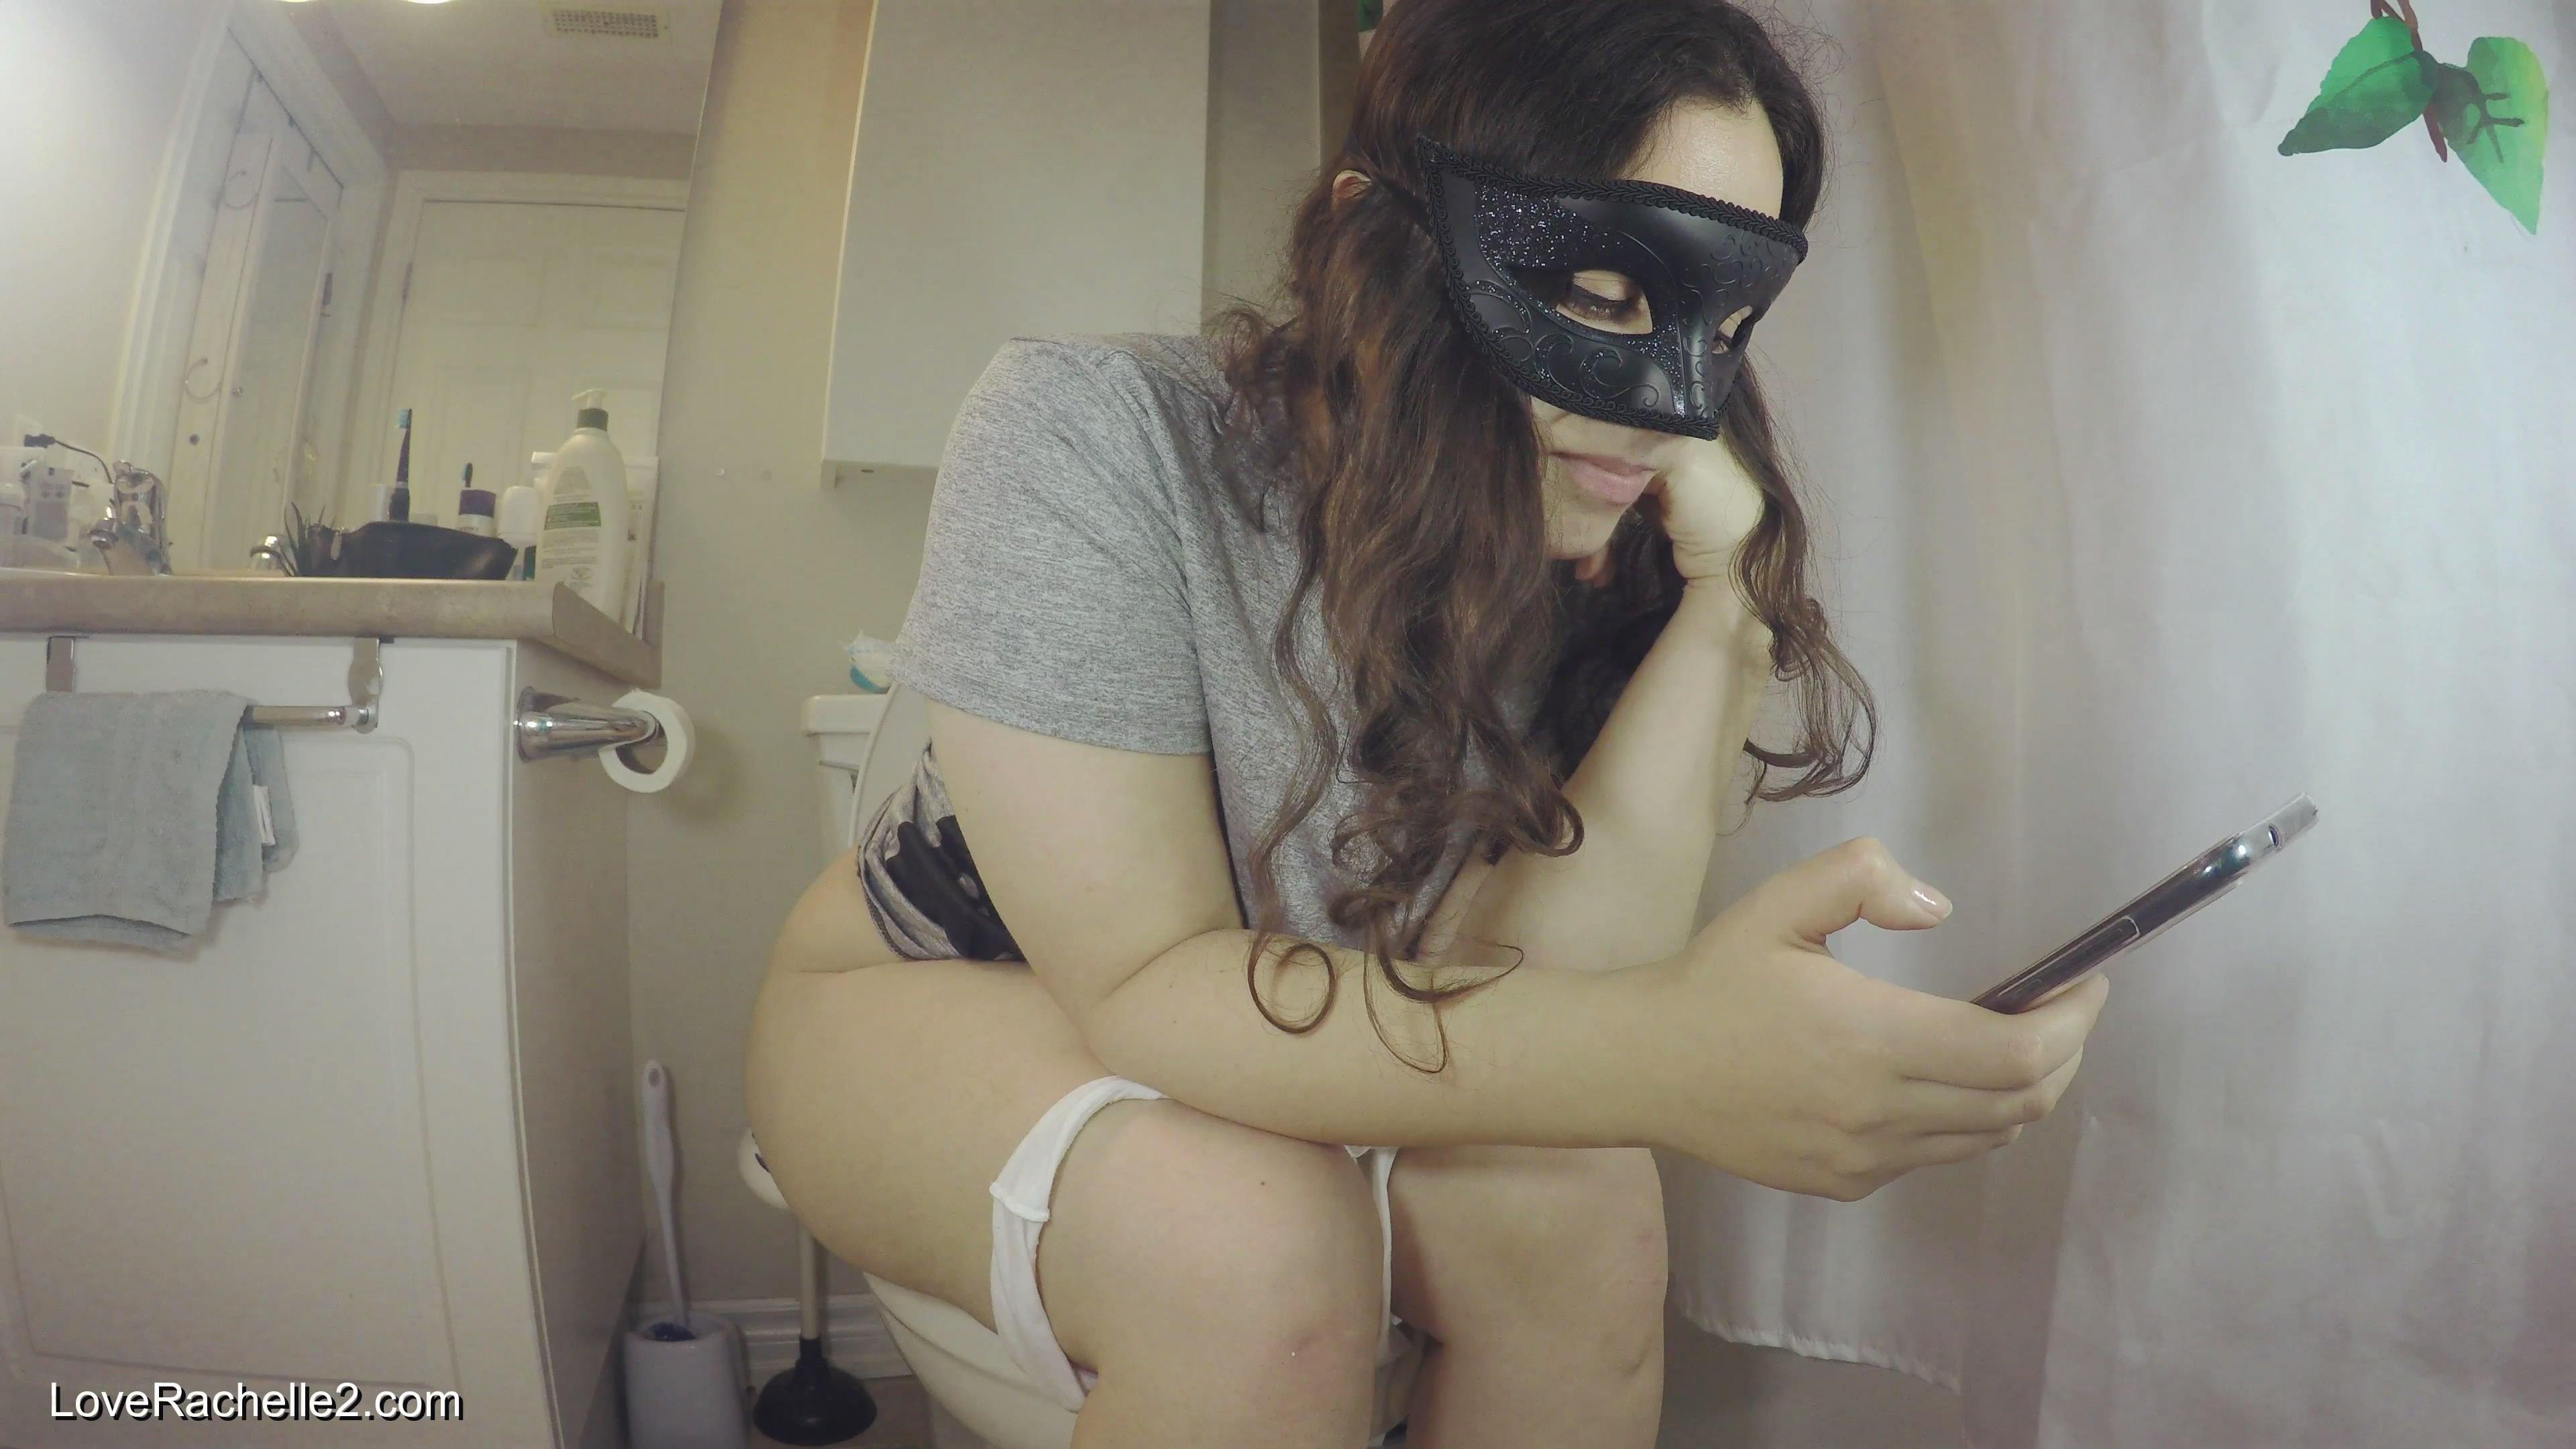 Struggling On The Toilet starring in video LoveRachelle2